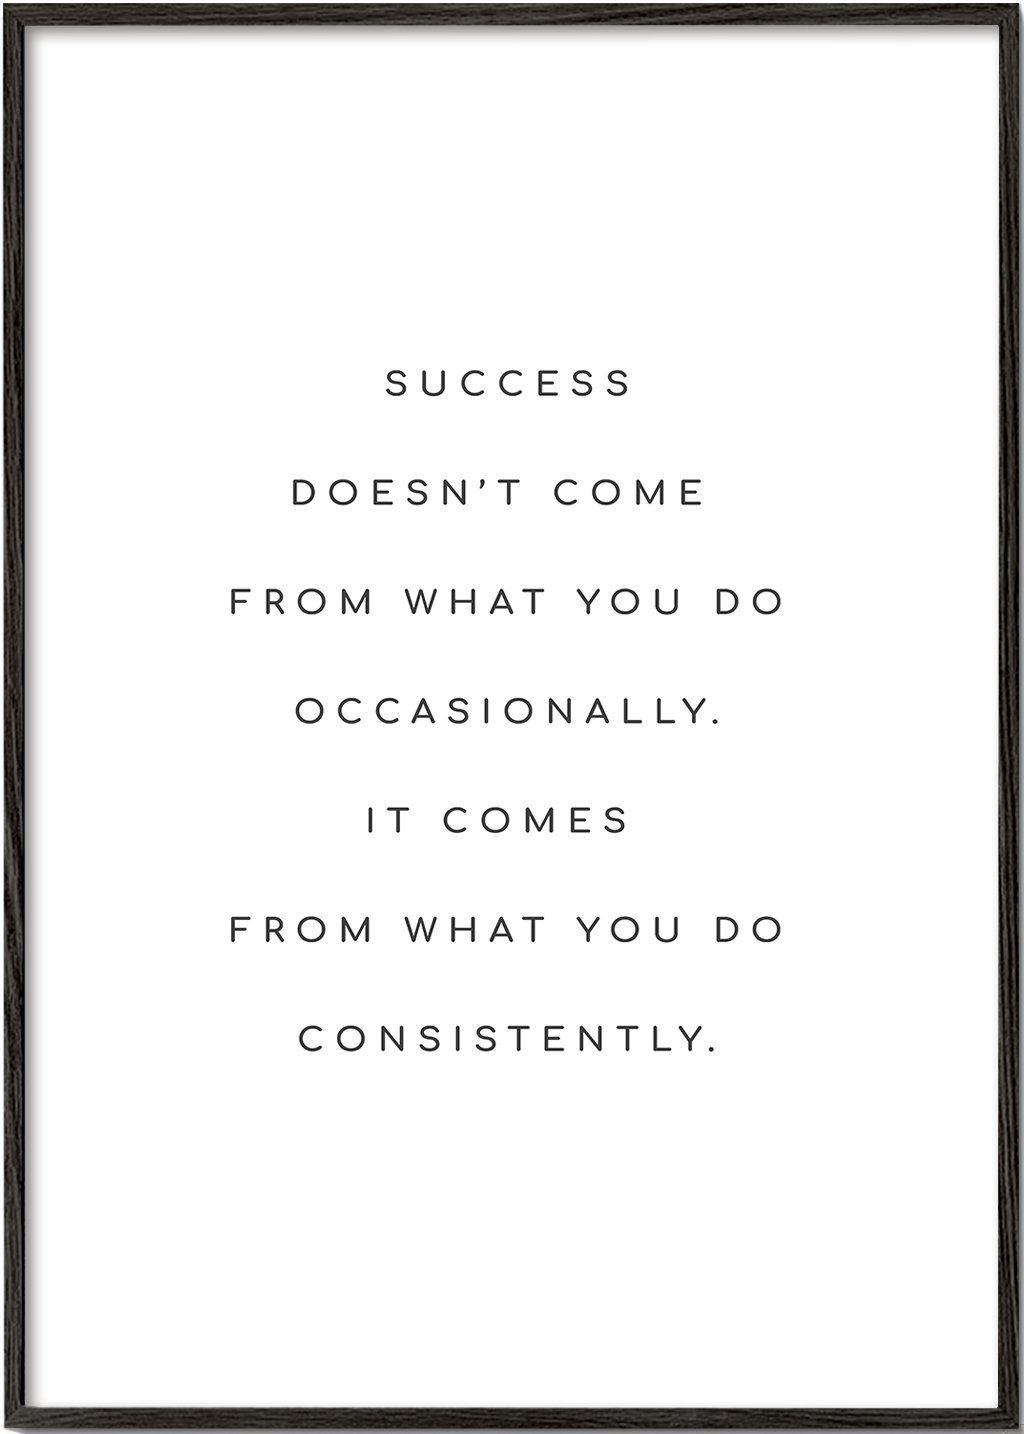 Success quote - Marco blanco / 70x100 / No